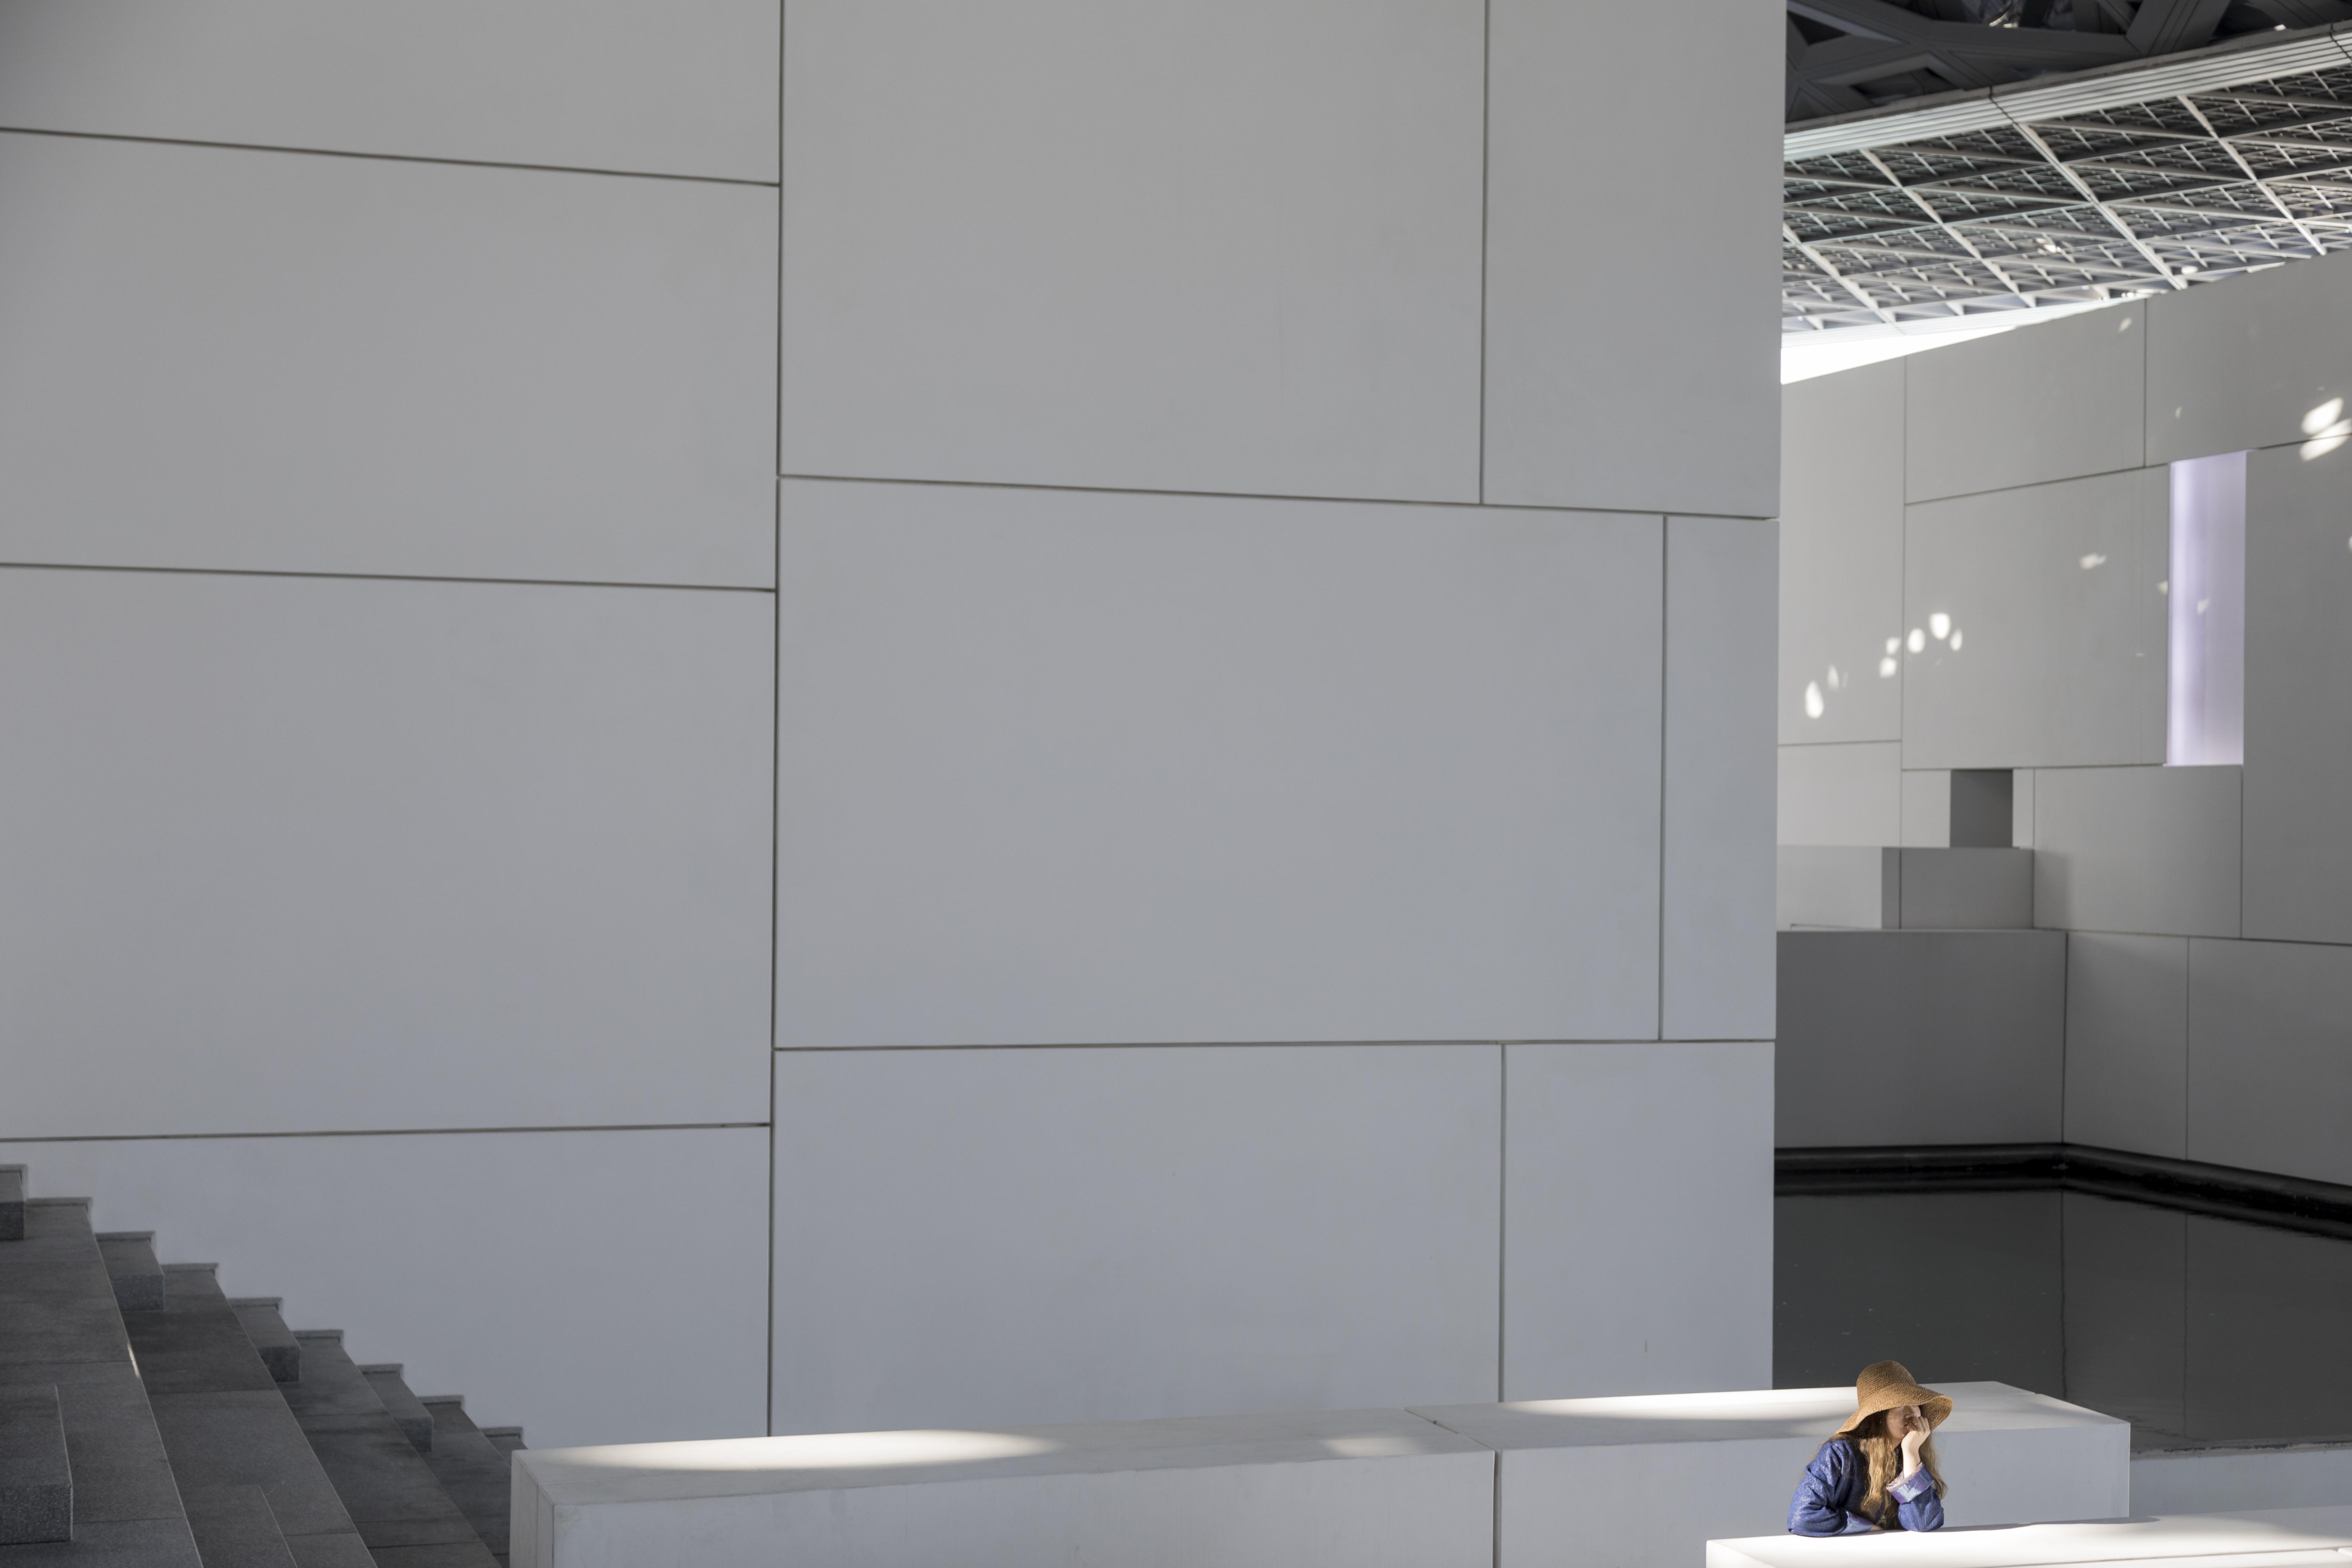 architecture photography, Jean nouvel Abu Dhabi Louvre Museum, UAE